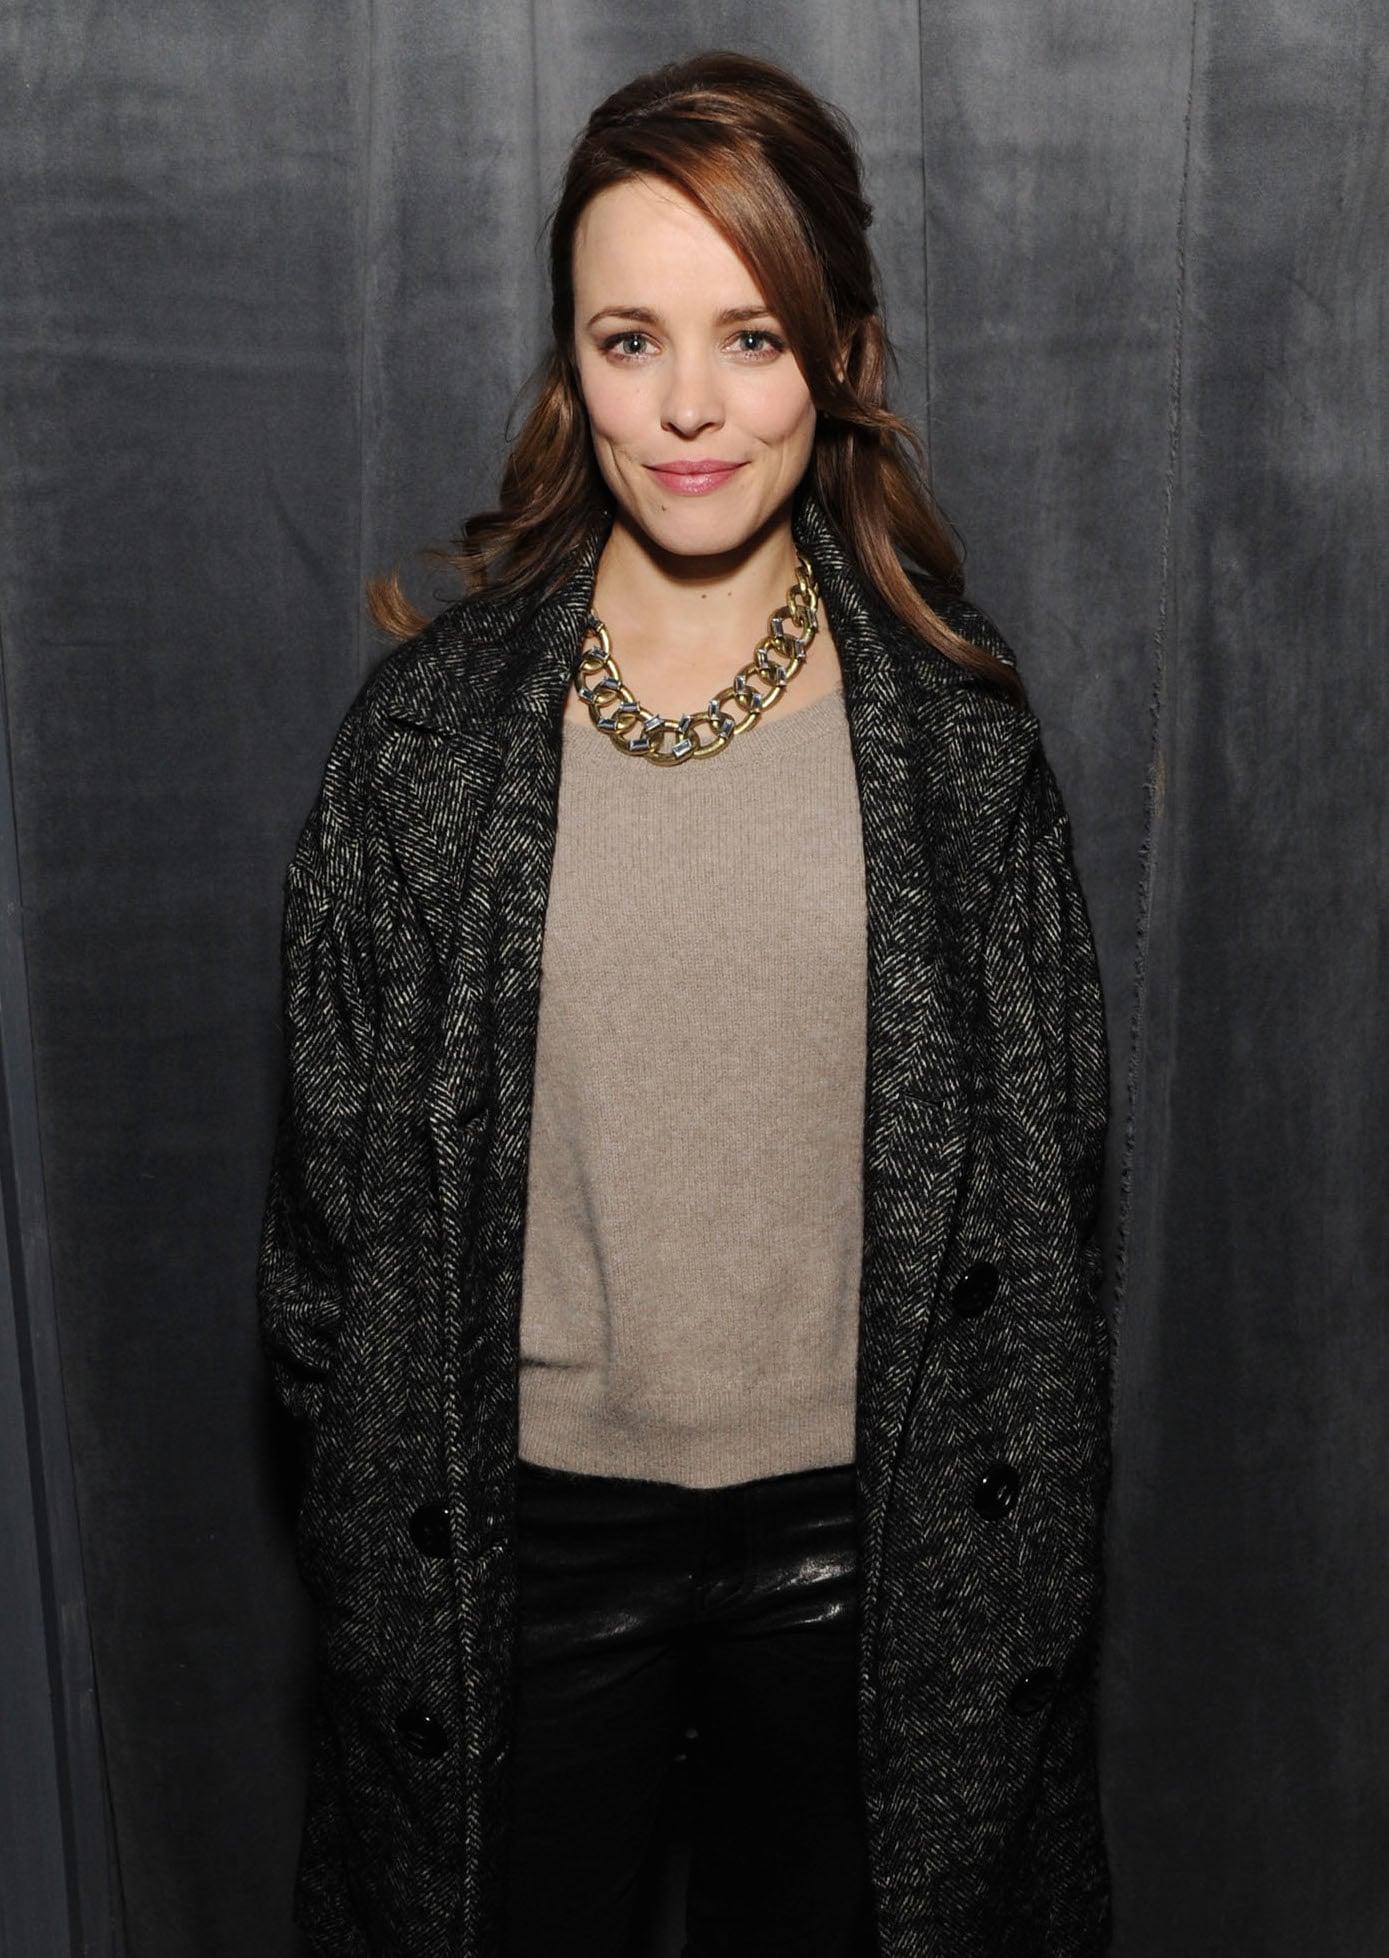 Rachel McAdams | True Detective Season 2: HBO Finally Confirms